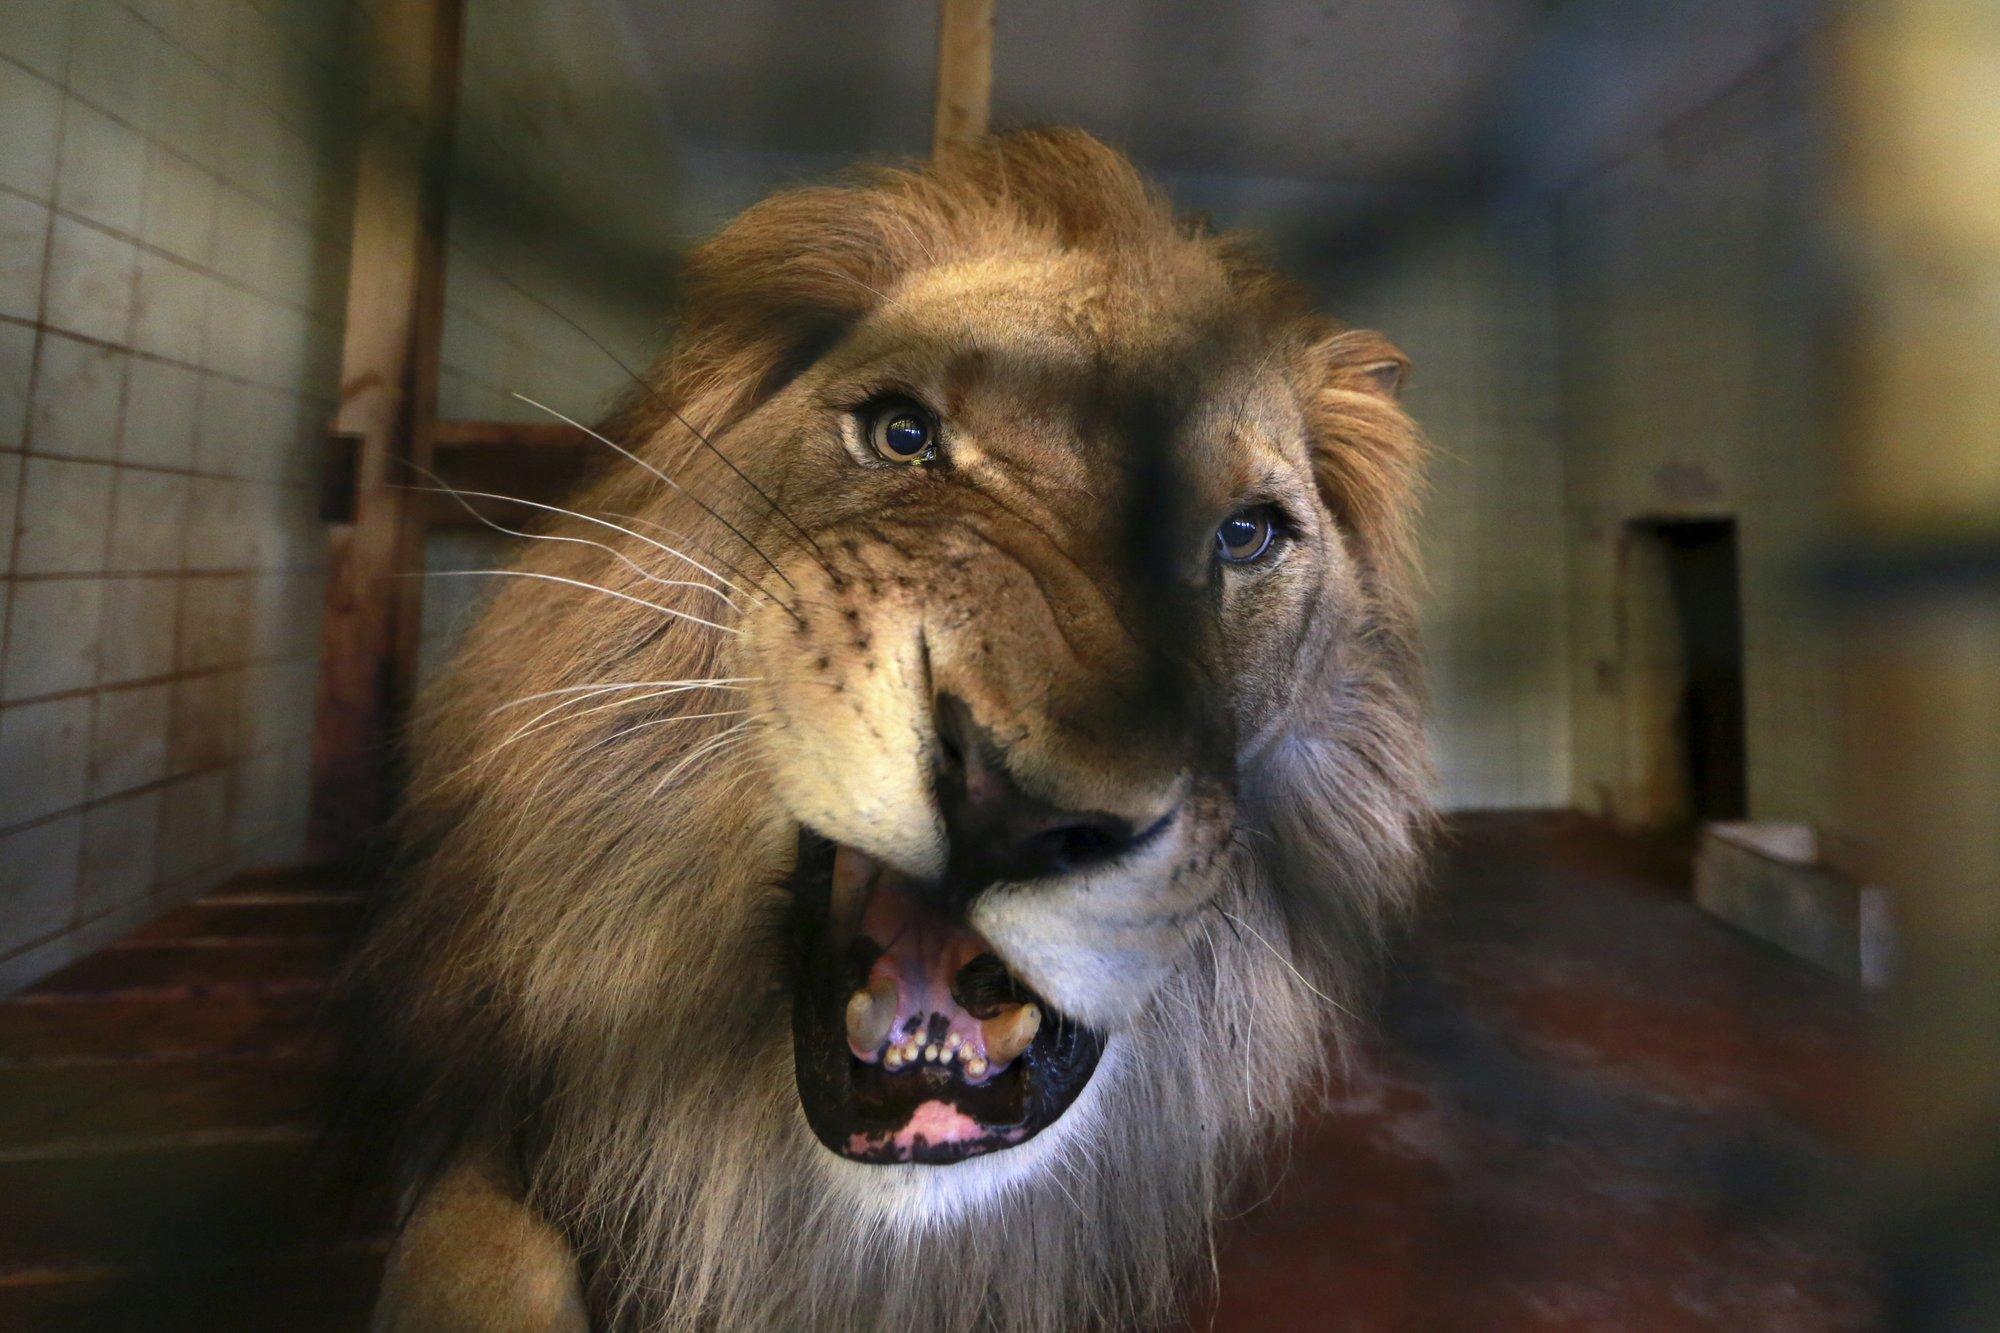 Animal welfare group and Albania quarrel over 3 lions' fate